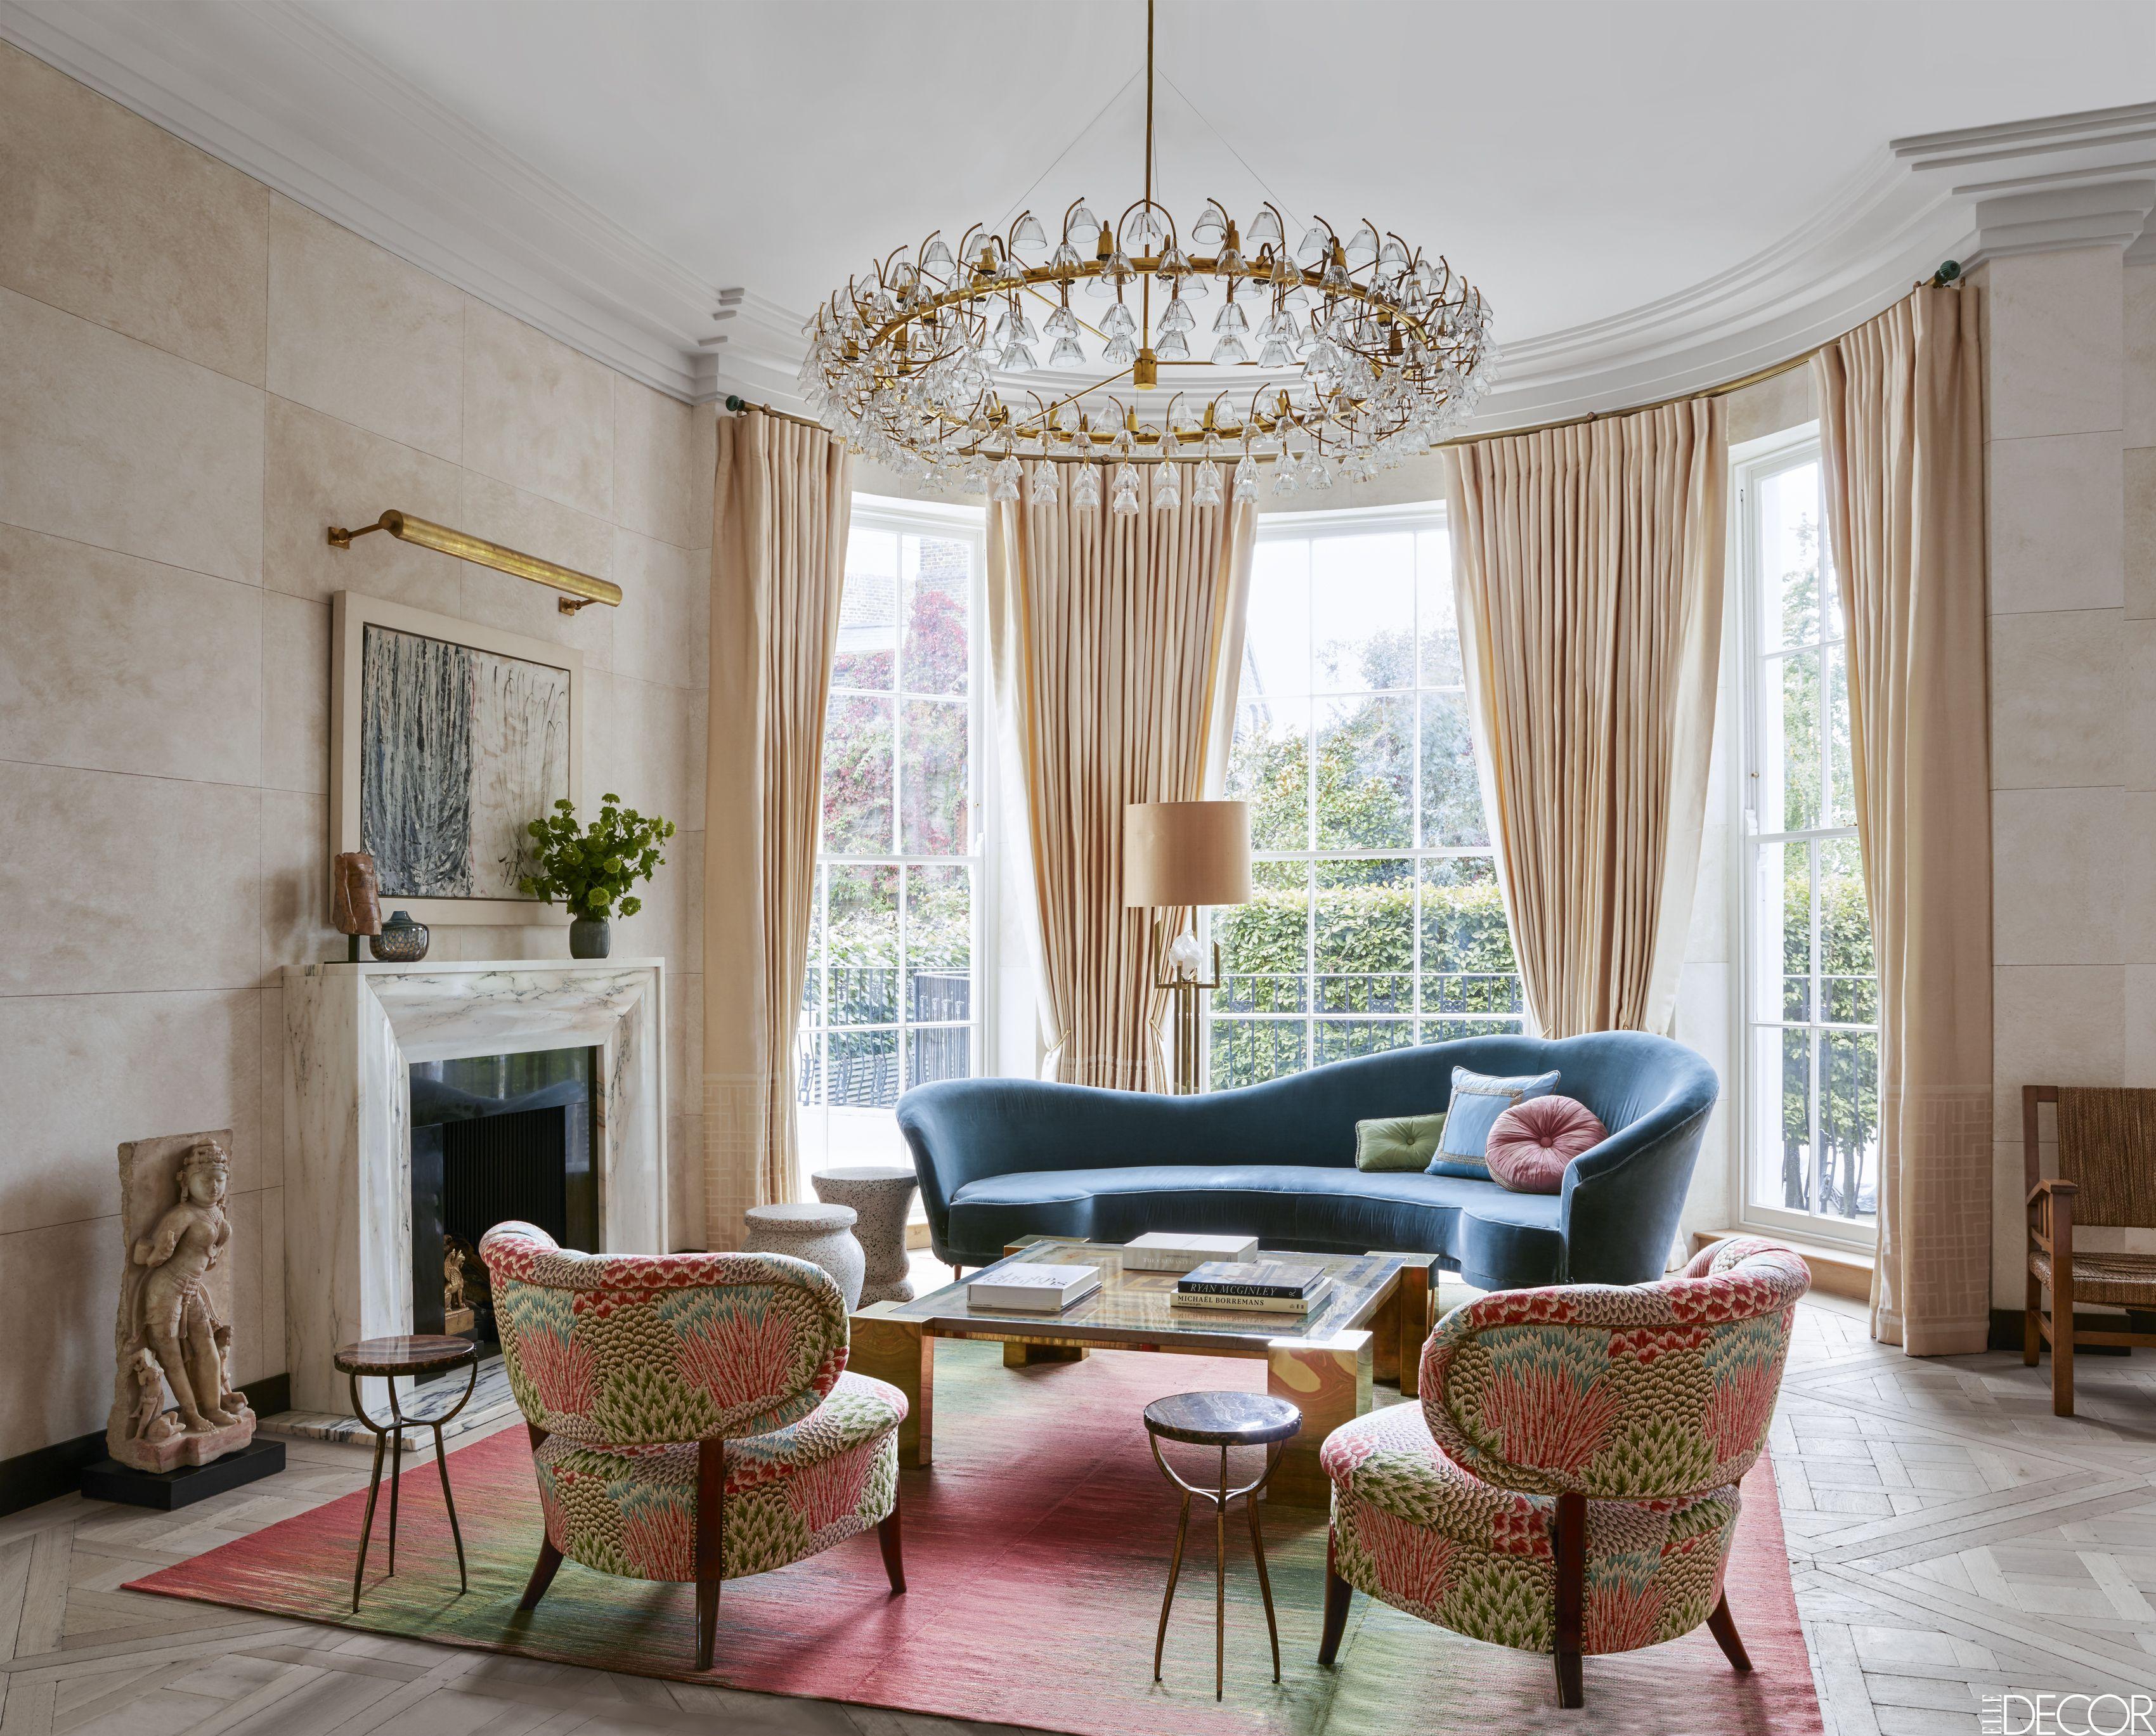 50 Inspiring Curtain Ideas - Window Drapes for Living Rooms on Living Room Drapes Ideas  id=78199